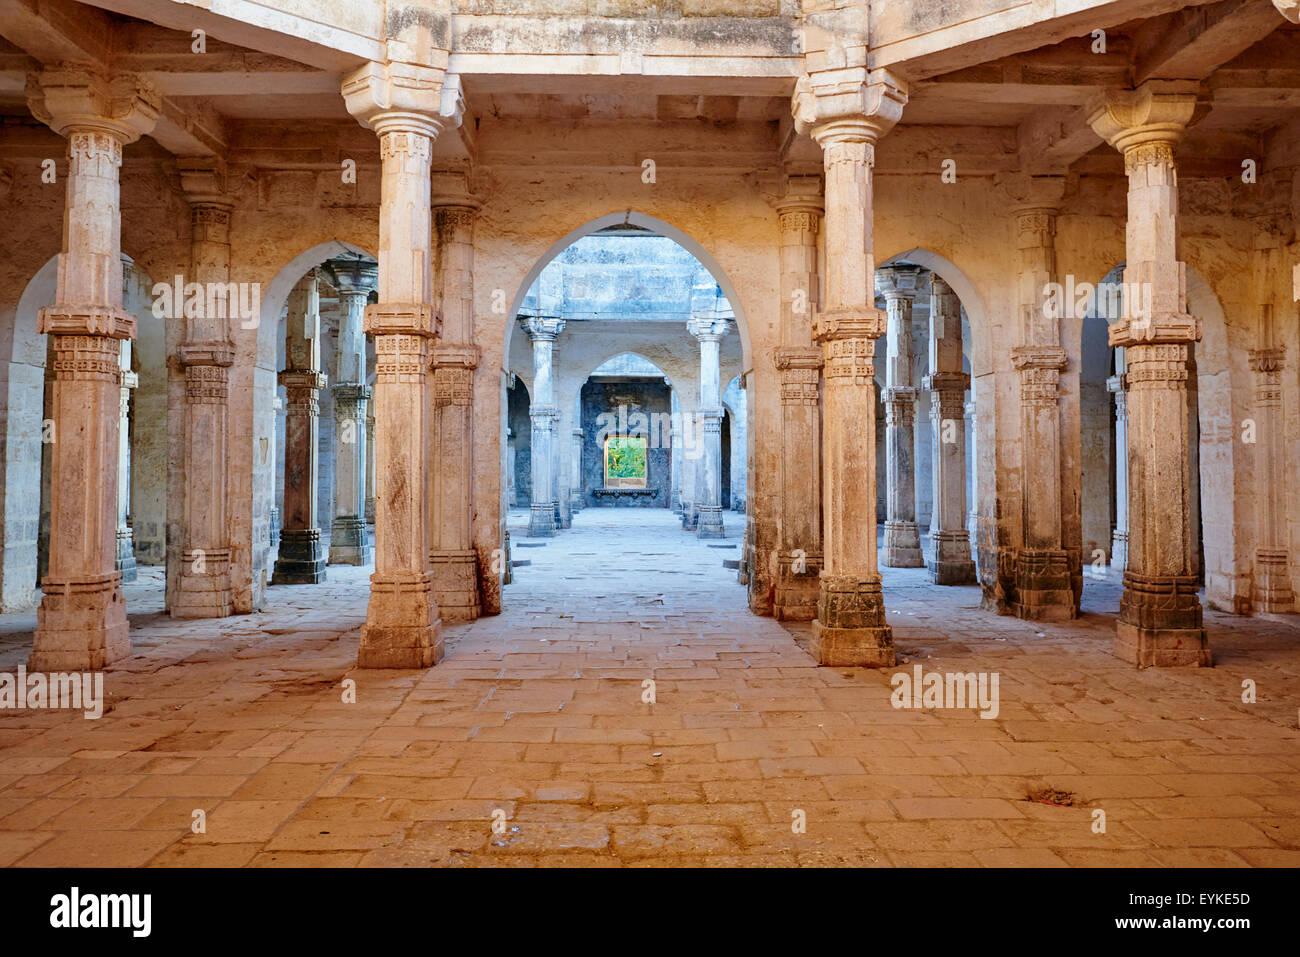 The spooky uparkot fort junagadh gujarat - India Gujarat Junagadh Uparkot Fort Juma Masjid Mosque